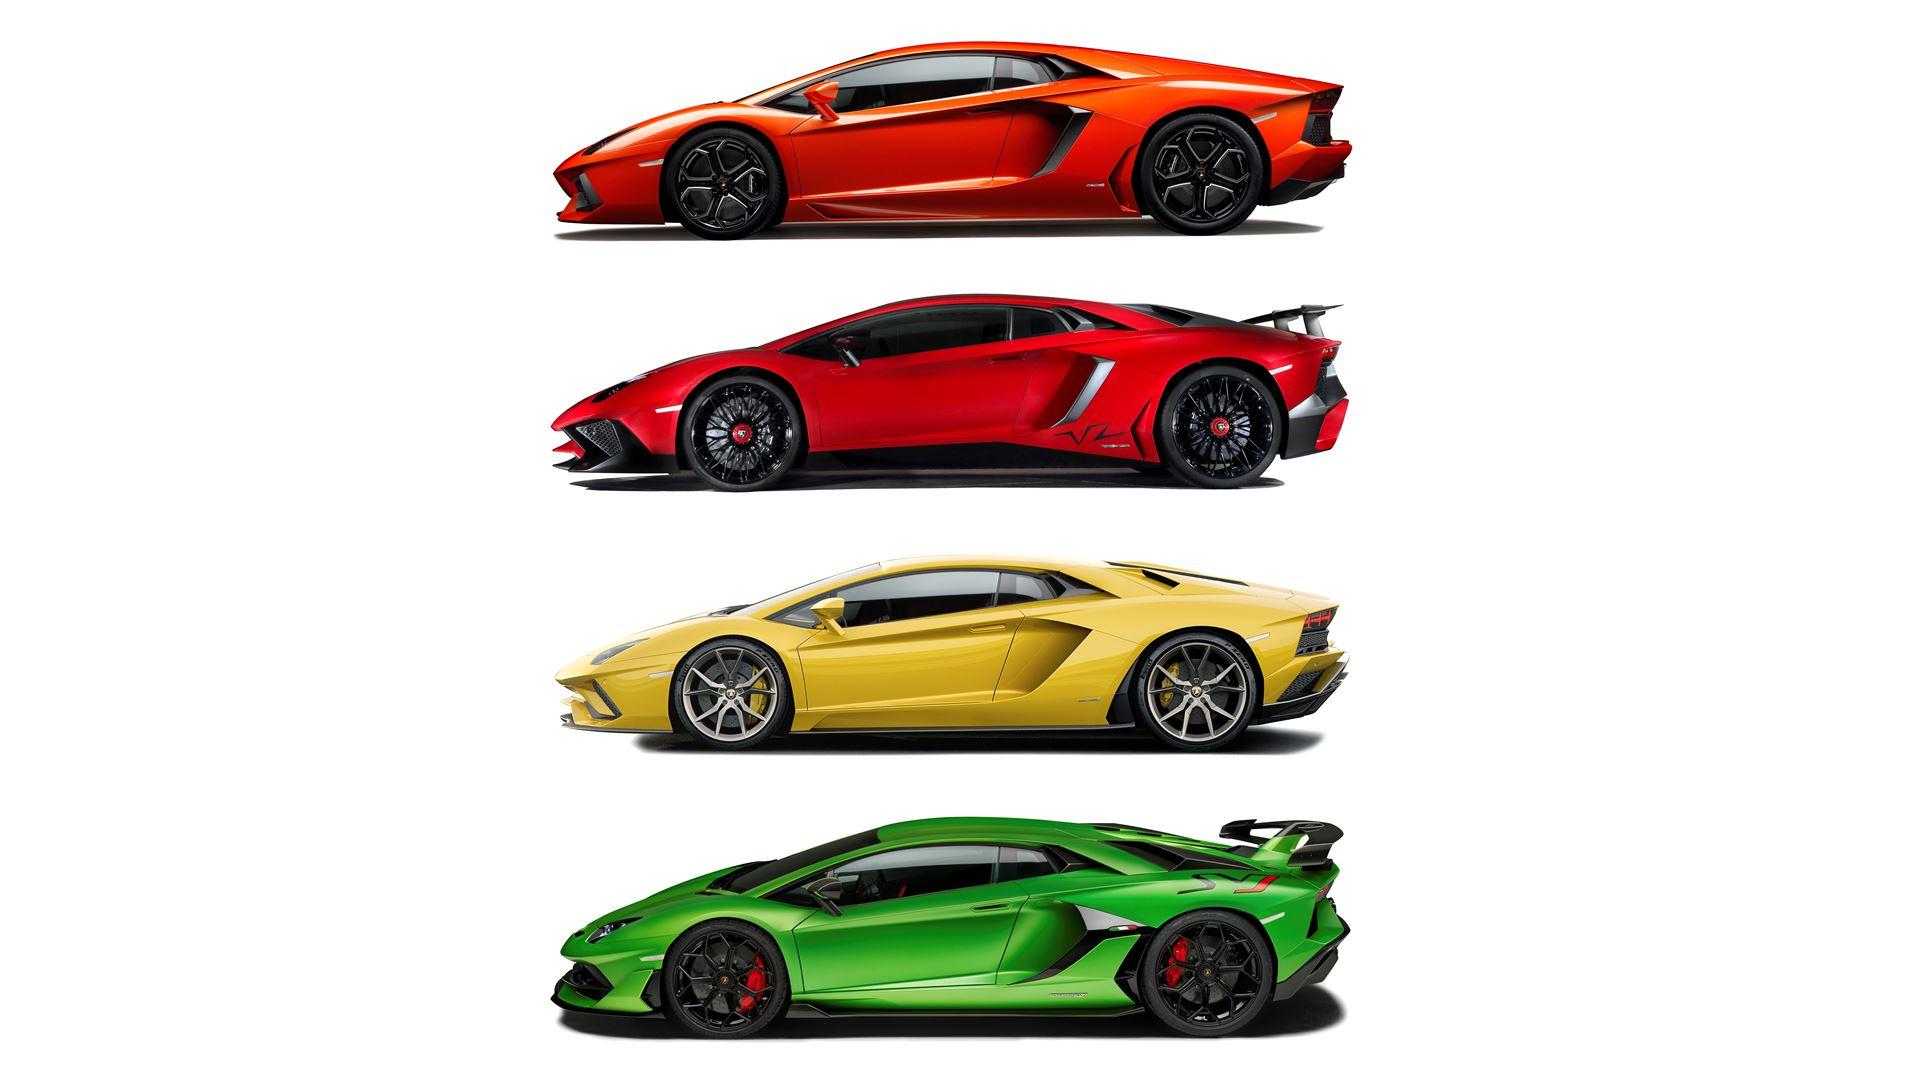 Lamborghini Aventador: 10 innovations in 10 years - Image 8